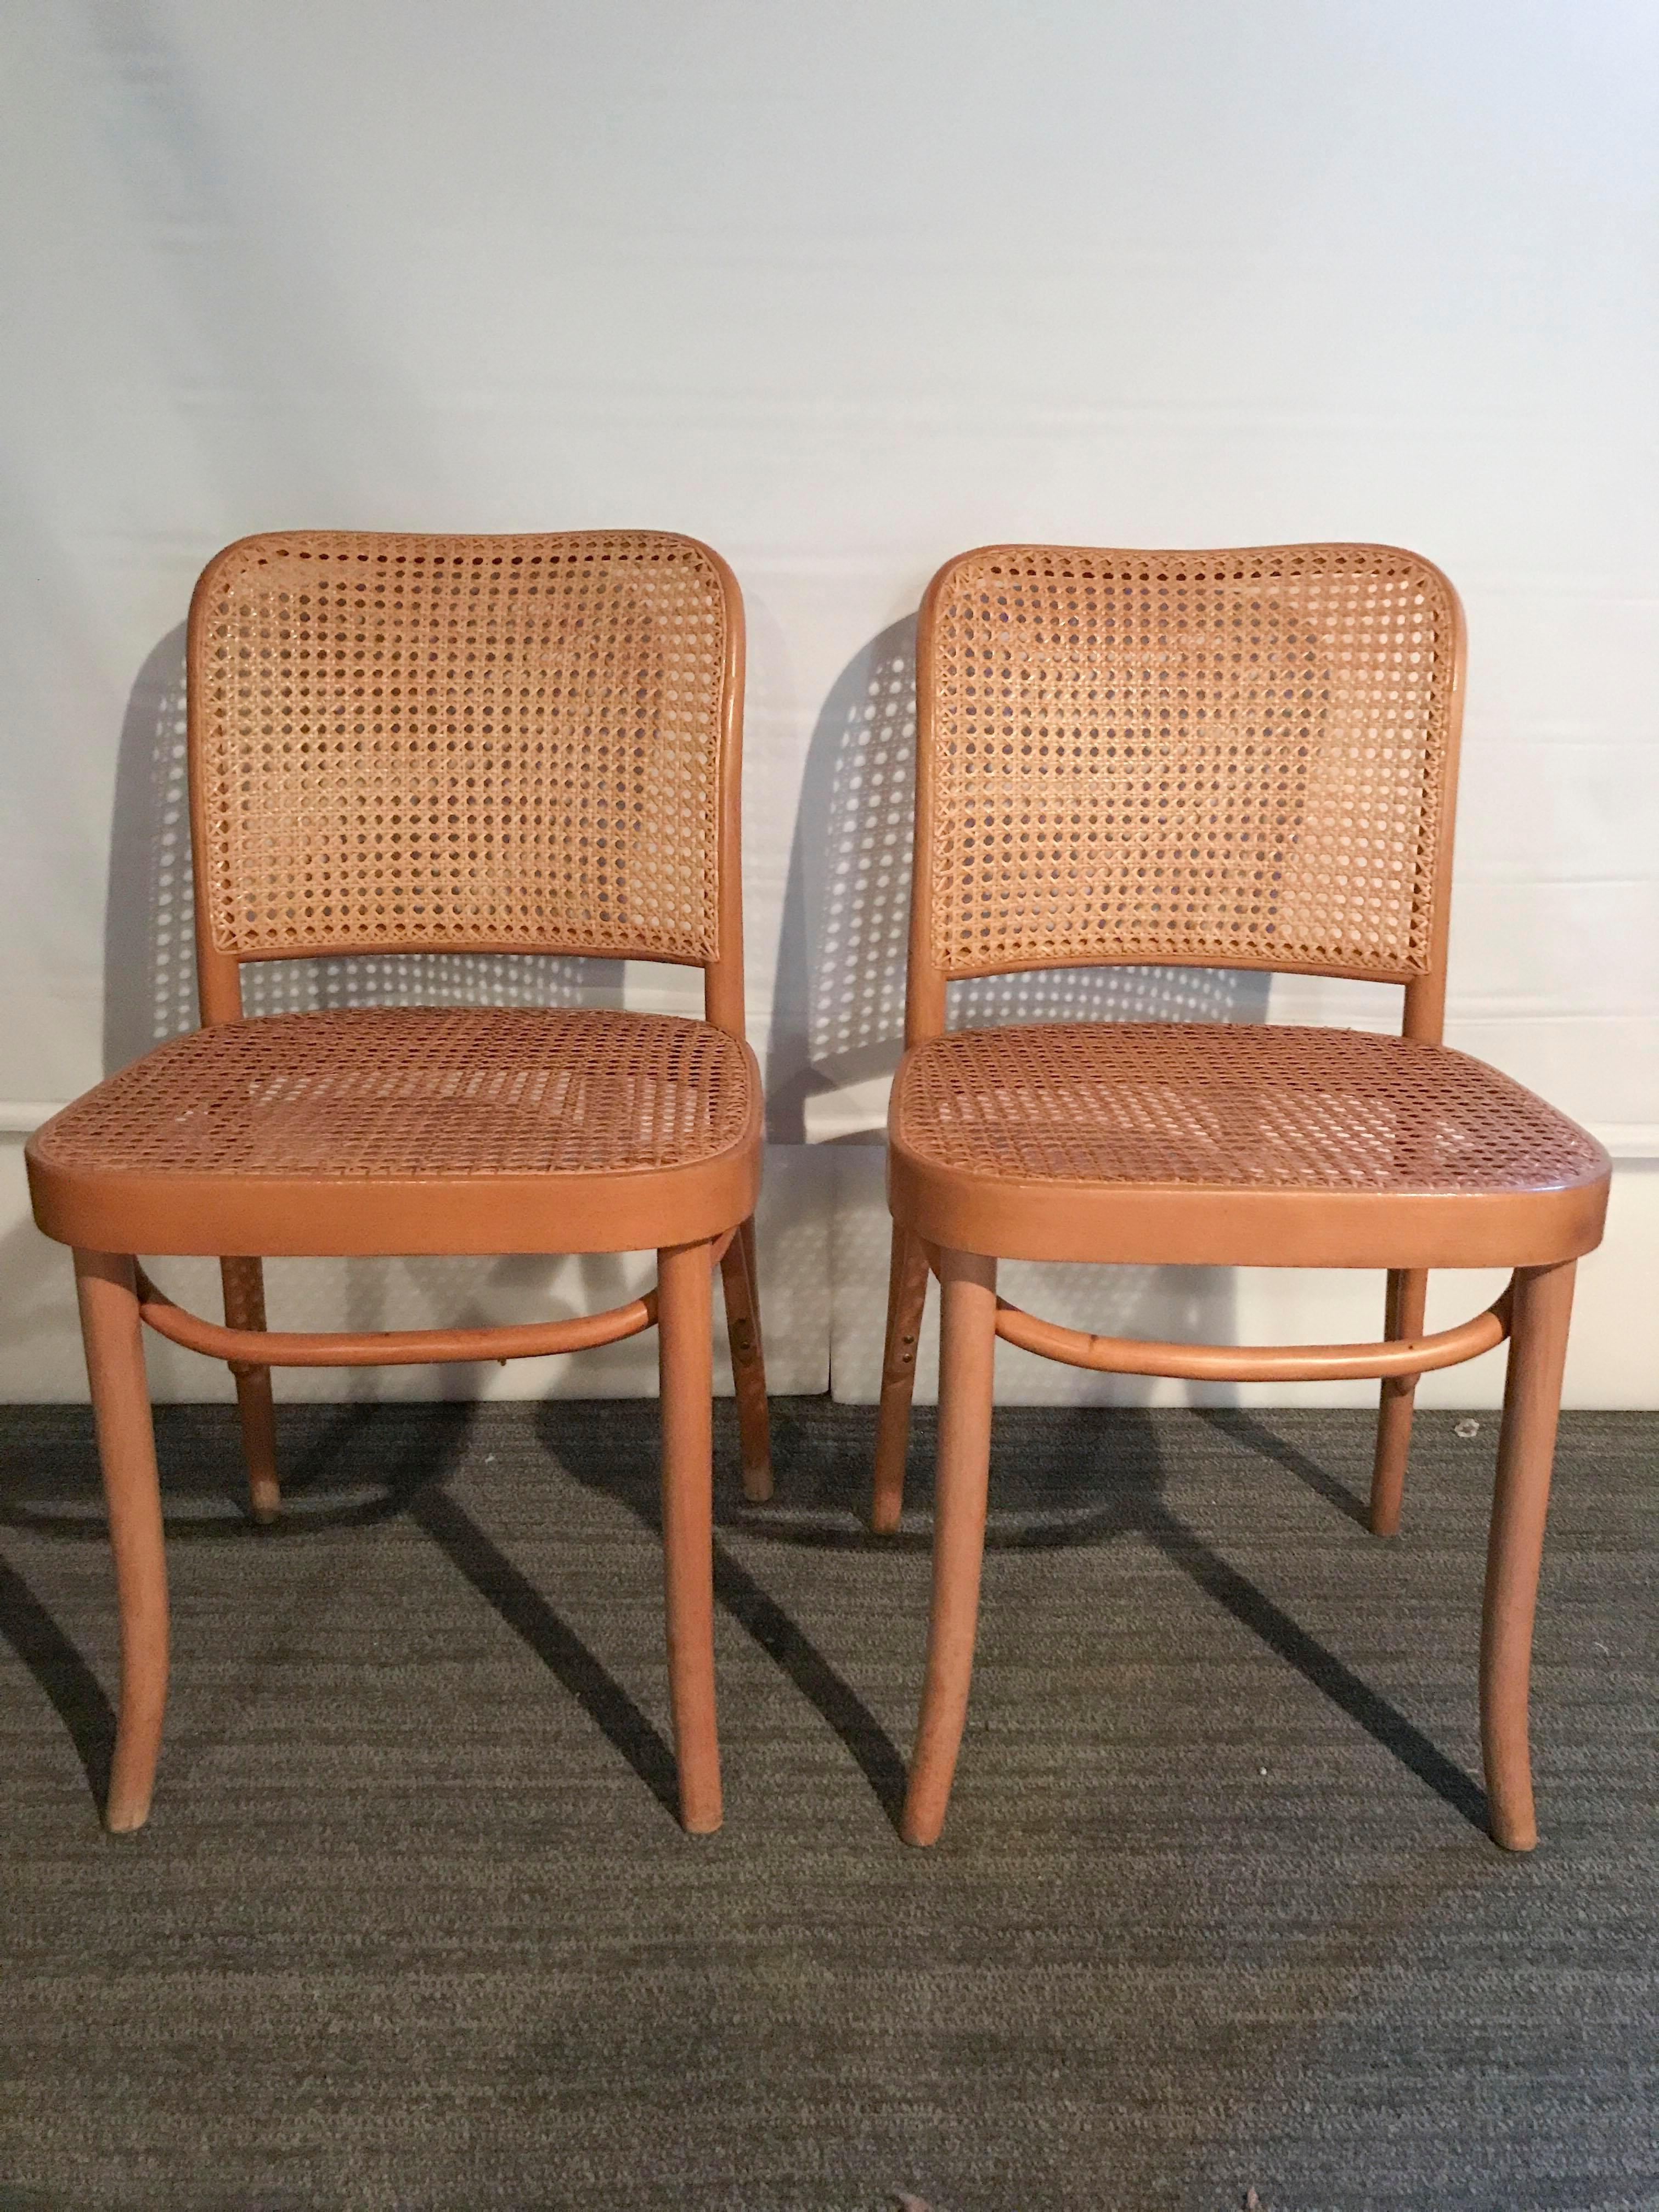 Thonet Josef Hoffman No. 811 Bentwood Prague Chairs   Set Of 6   Image 5